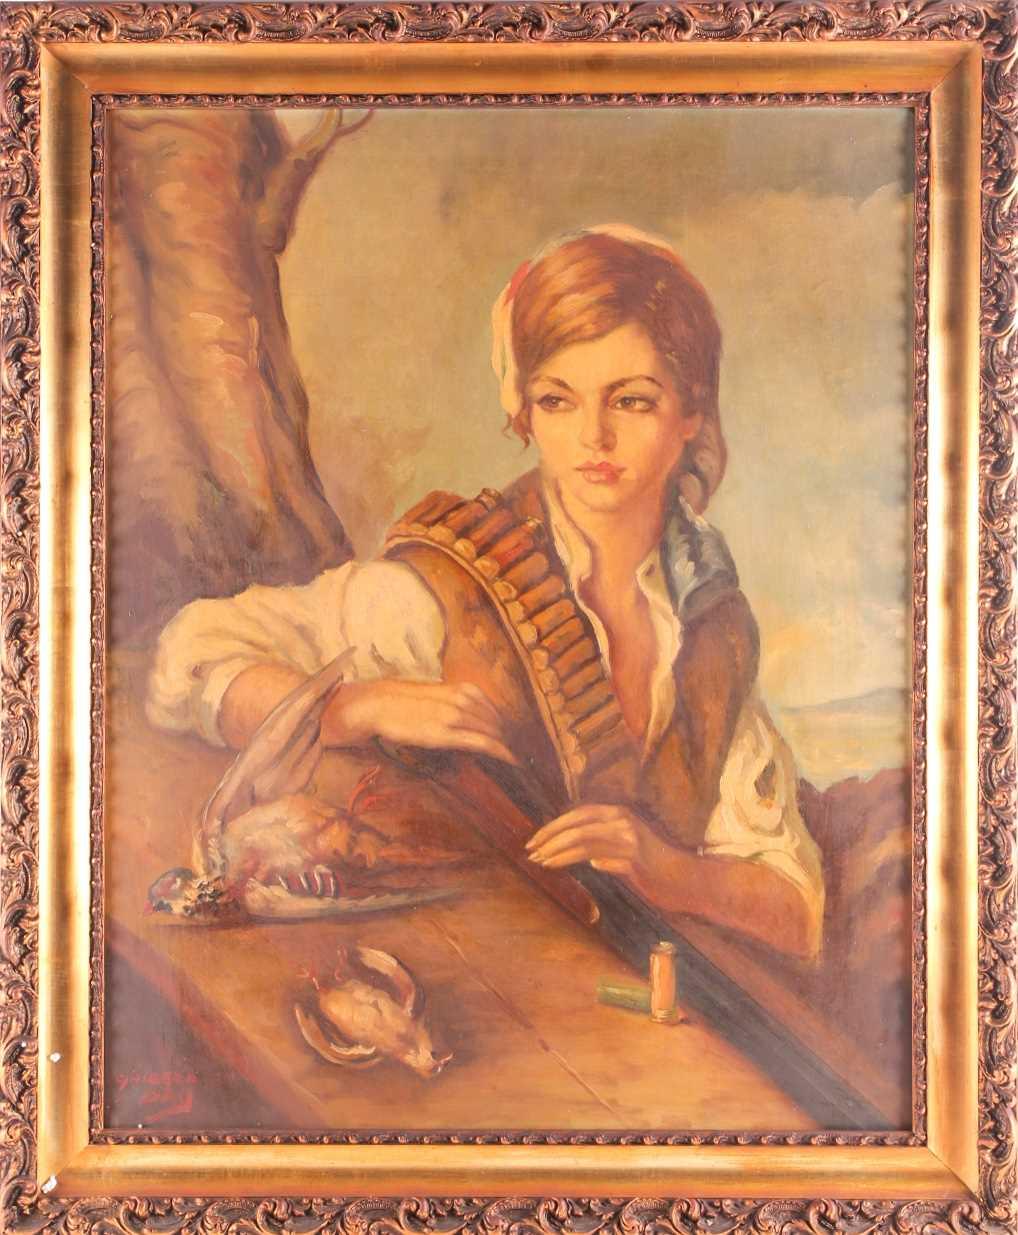 20th century Spanish school, manner of Francisco Ribera Gomez (1907-1990), a half-length portrait of